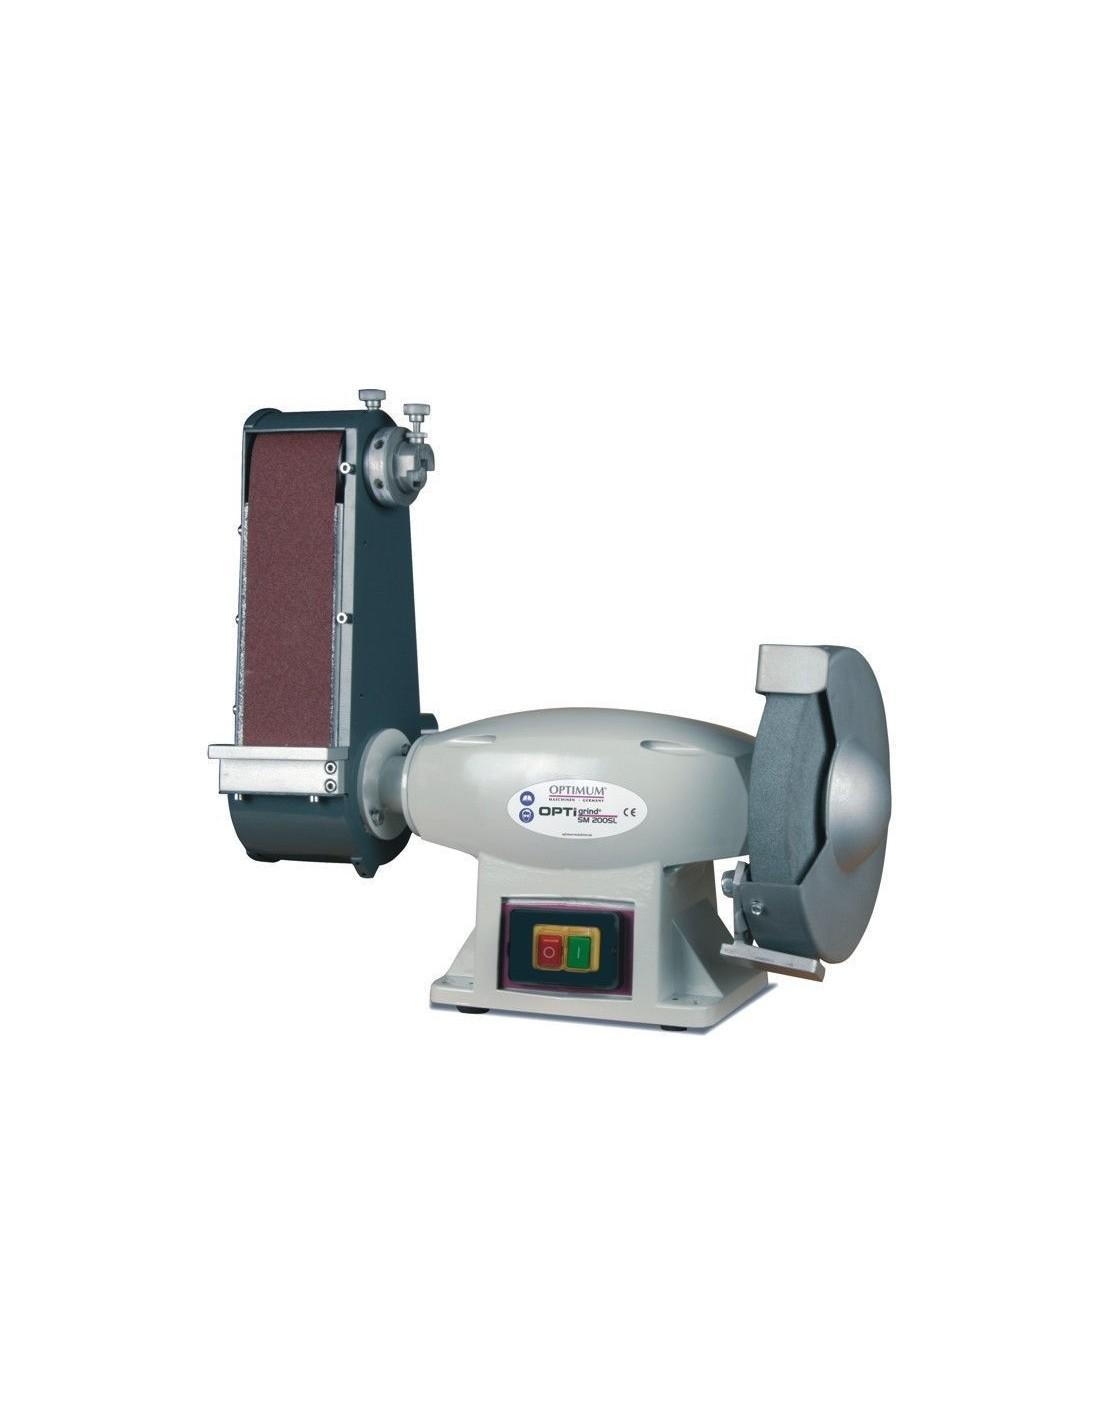 Masina pentru slefuit combinata Optimum SM 200 SL - 400 V